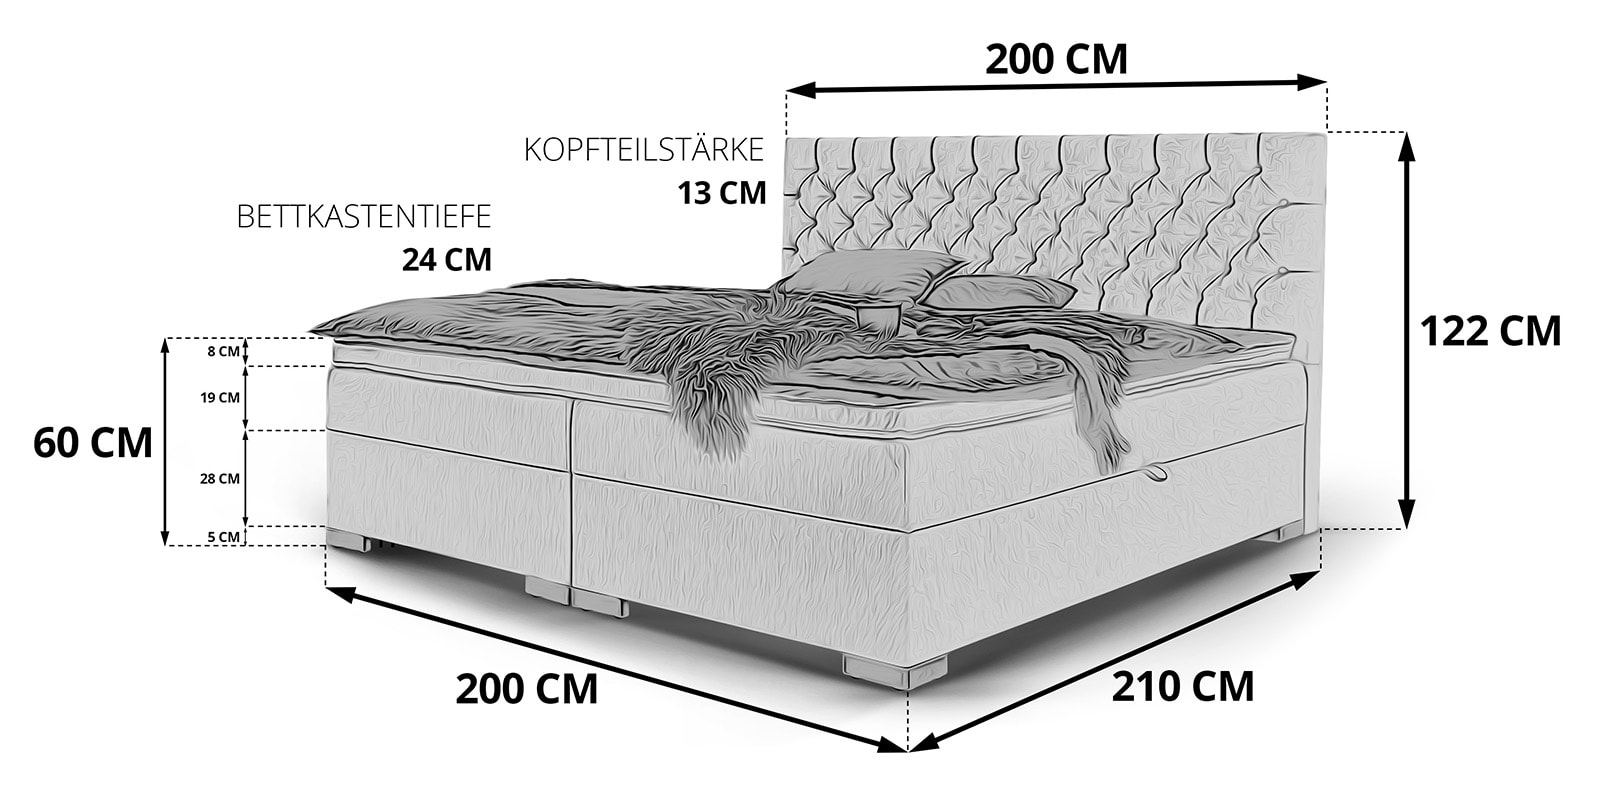 Full Size of Boxspringbett Mit Bettkasten Stauraum Bett London Skizze 200x200 120x200 Badewanne Bette 90x190 190x90 120 Cm Breit Aufbewahrung Betten Bei Ikea Weiß Bett Stauraum Bett 200x200